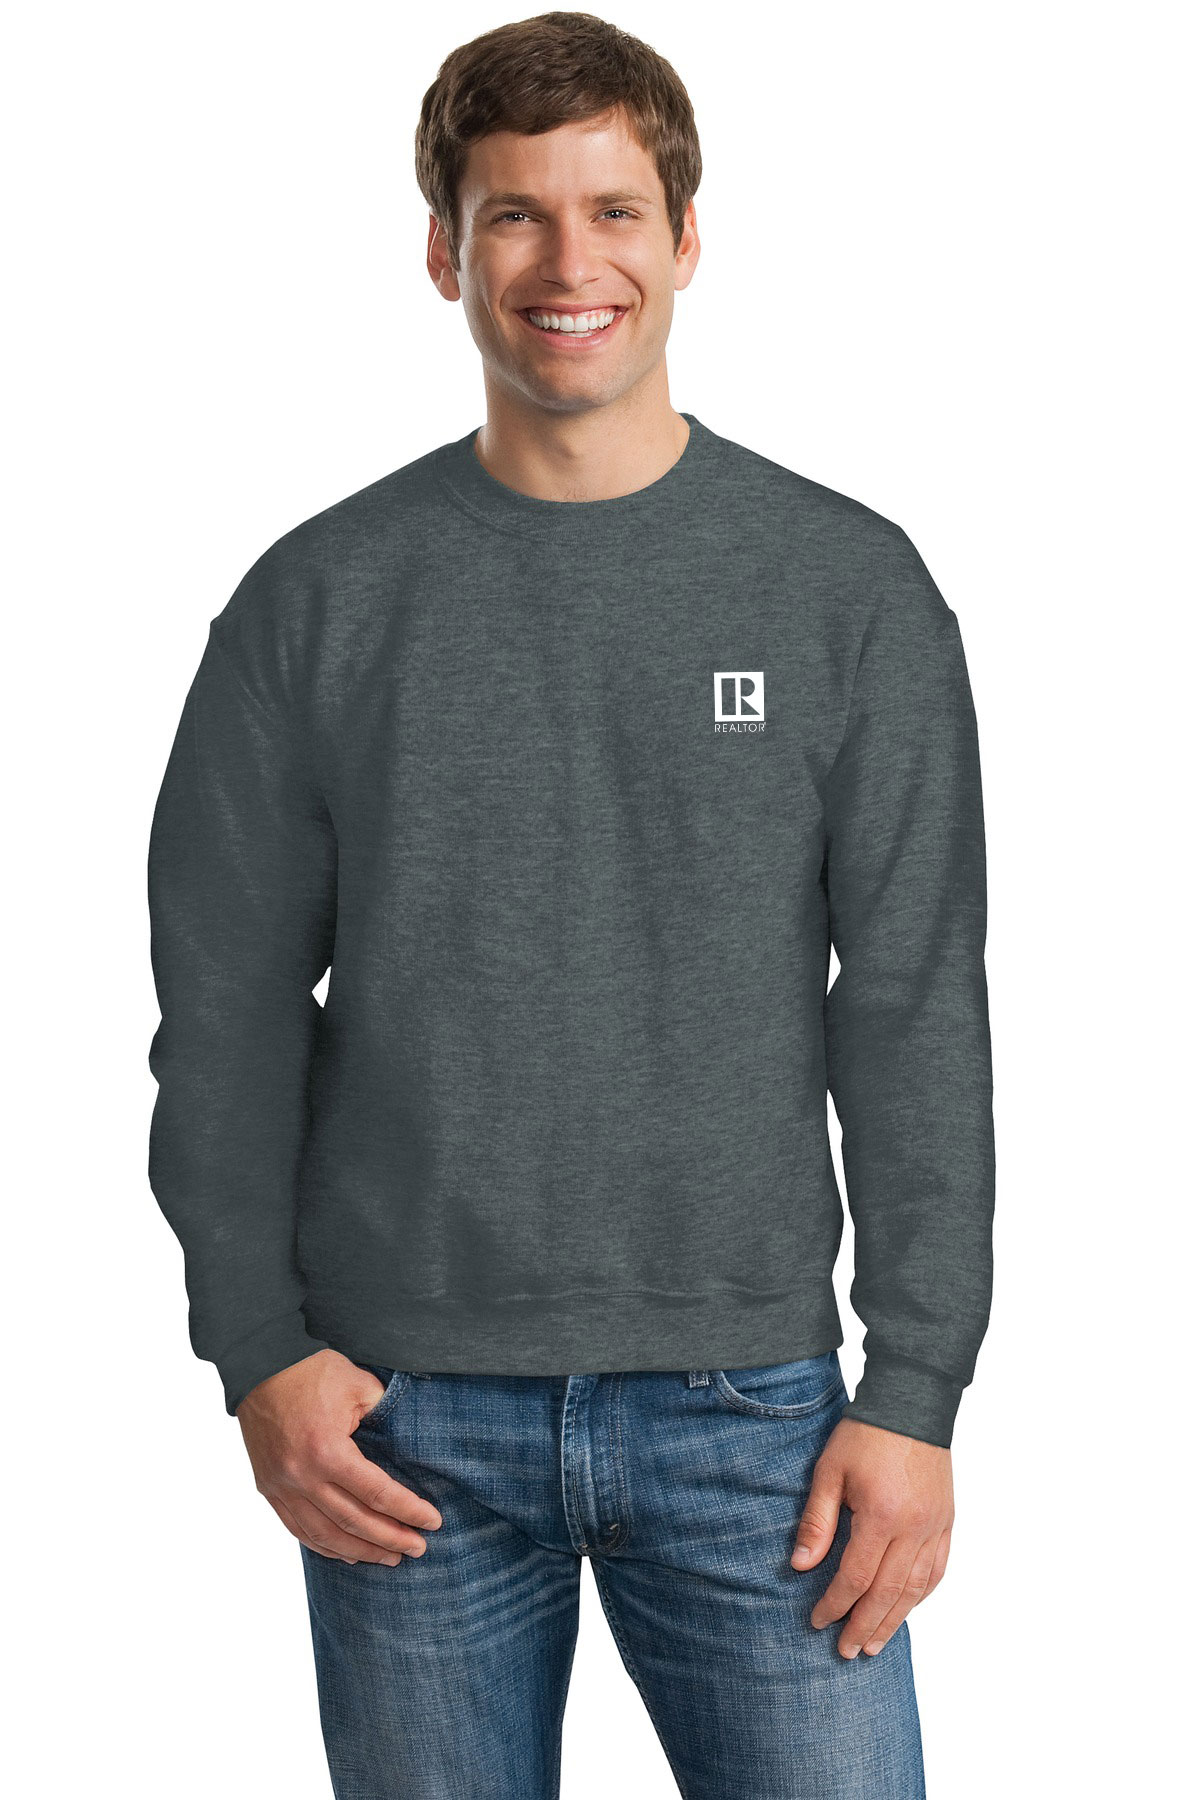 Crewneck Sweatshirt - RCG1160